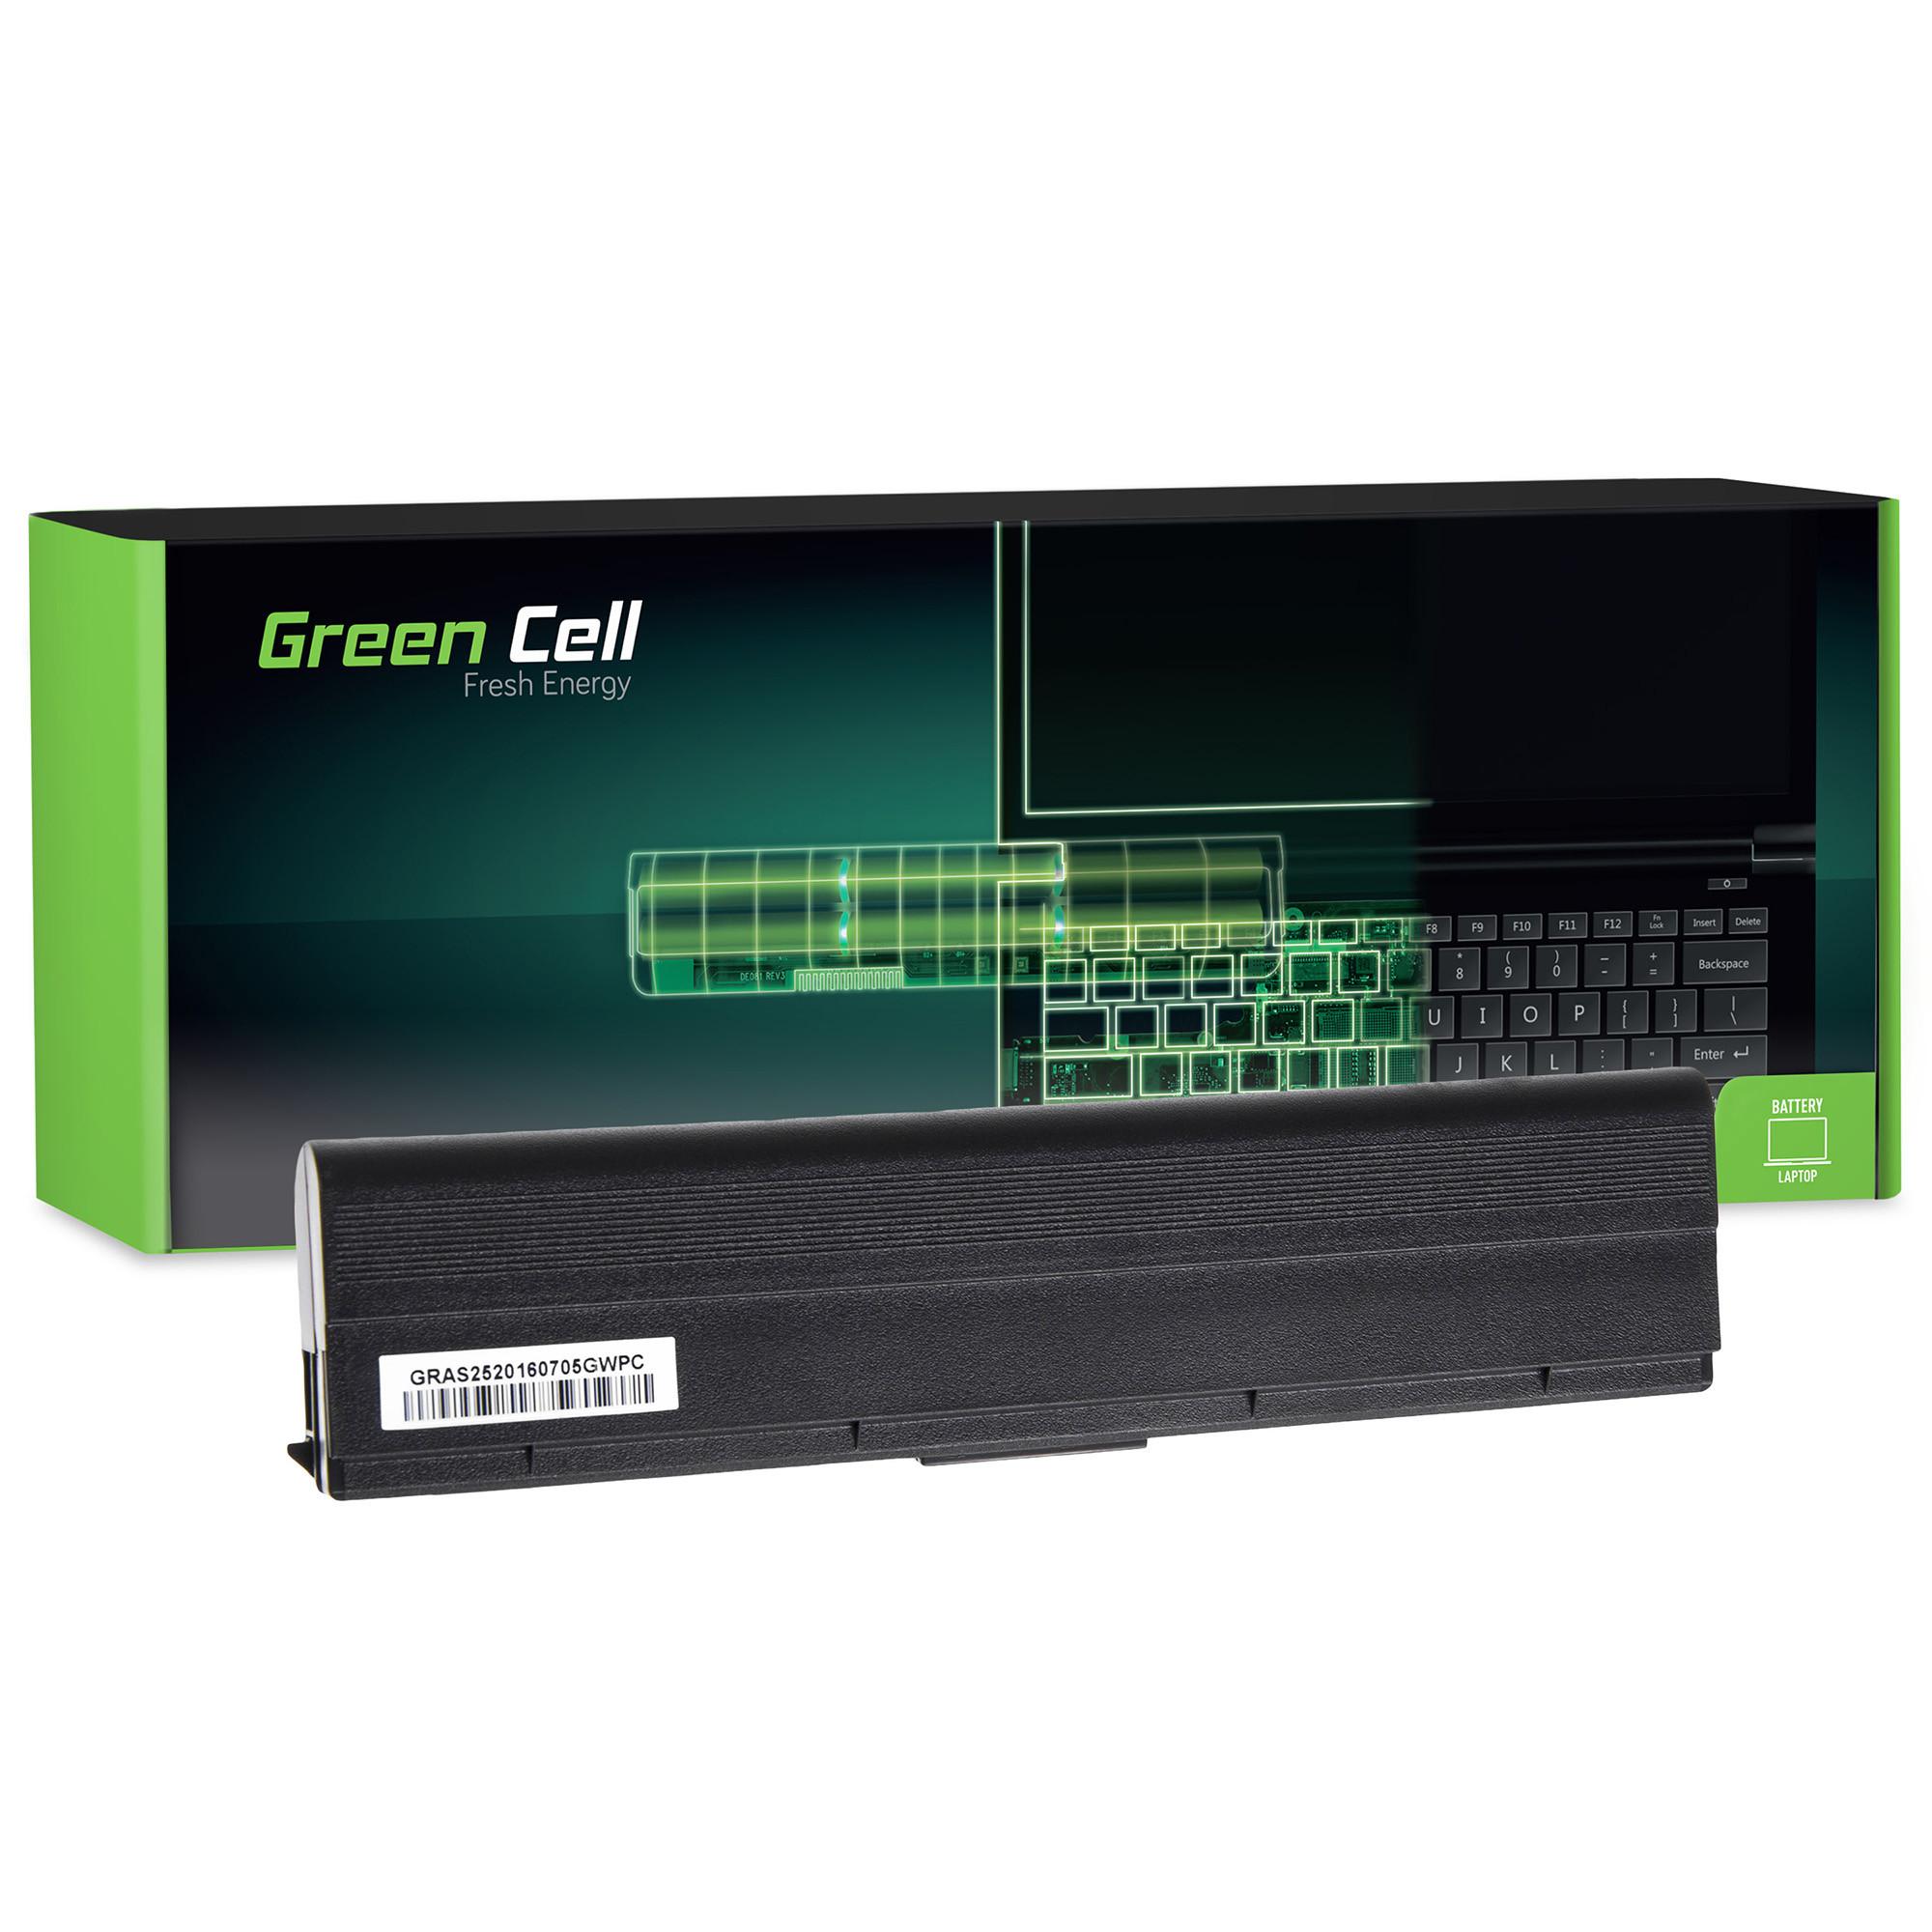 Green Cell AS25 Baterie Asus F6/F6A/F6E/F6K/F9/F9F/F9J/F9E 4400mAh Li-ion - neoriginální